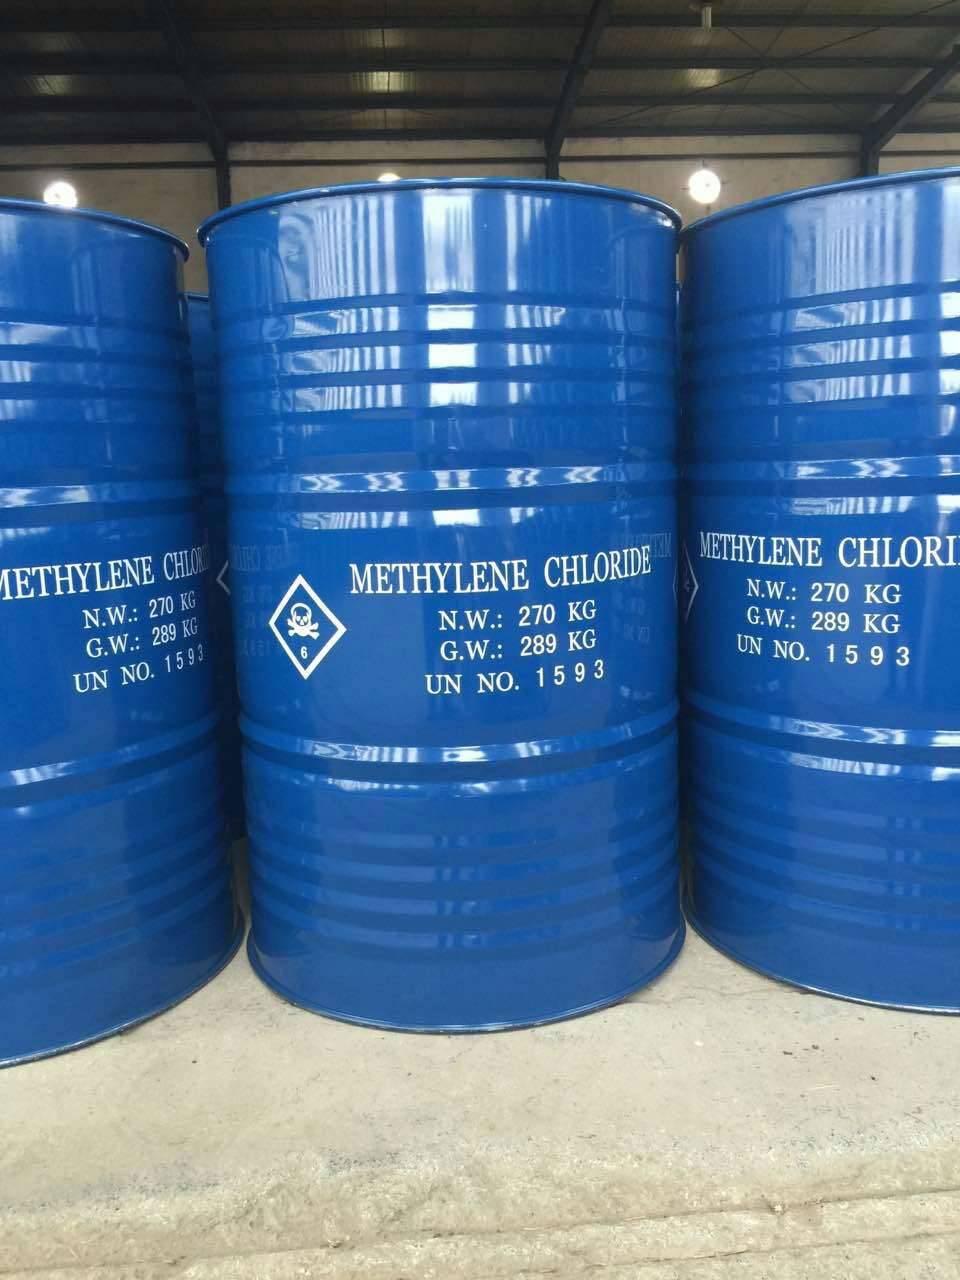 methylene chlroride